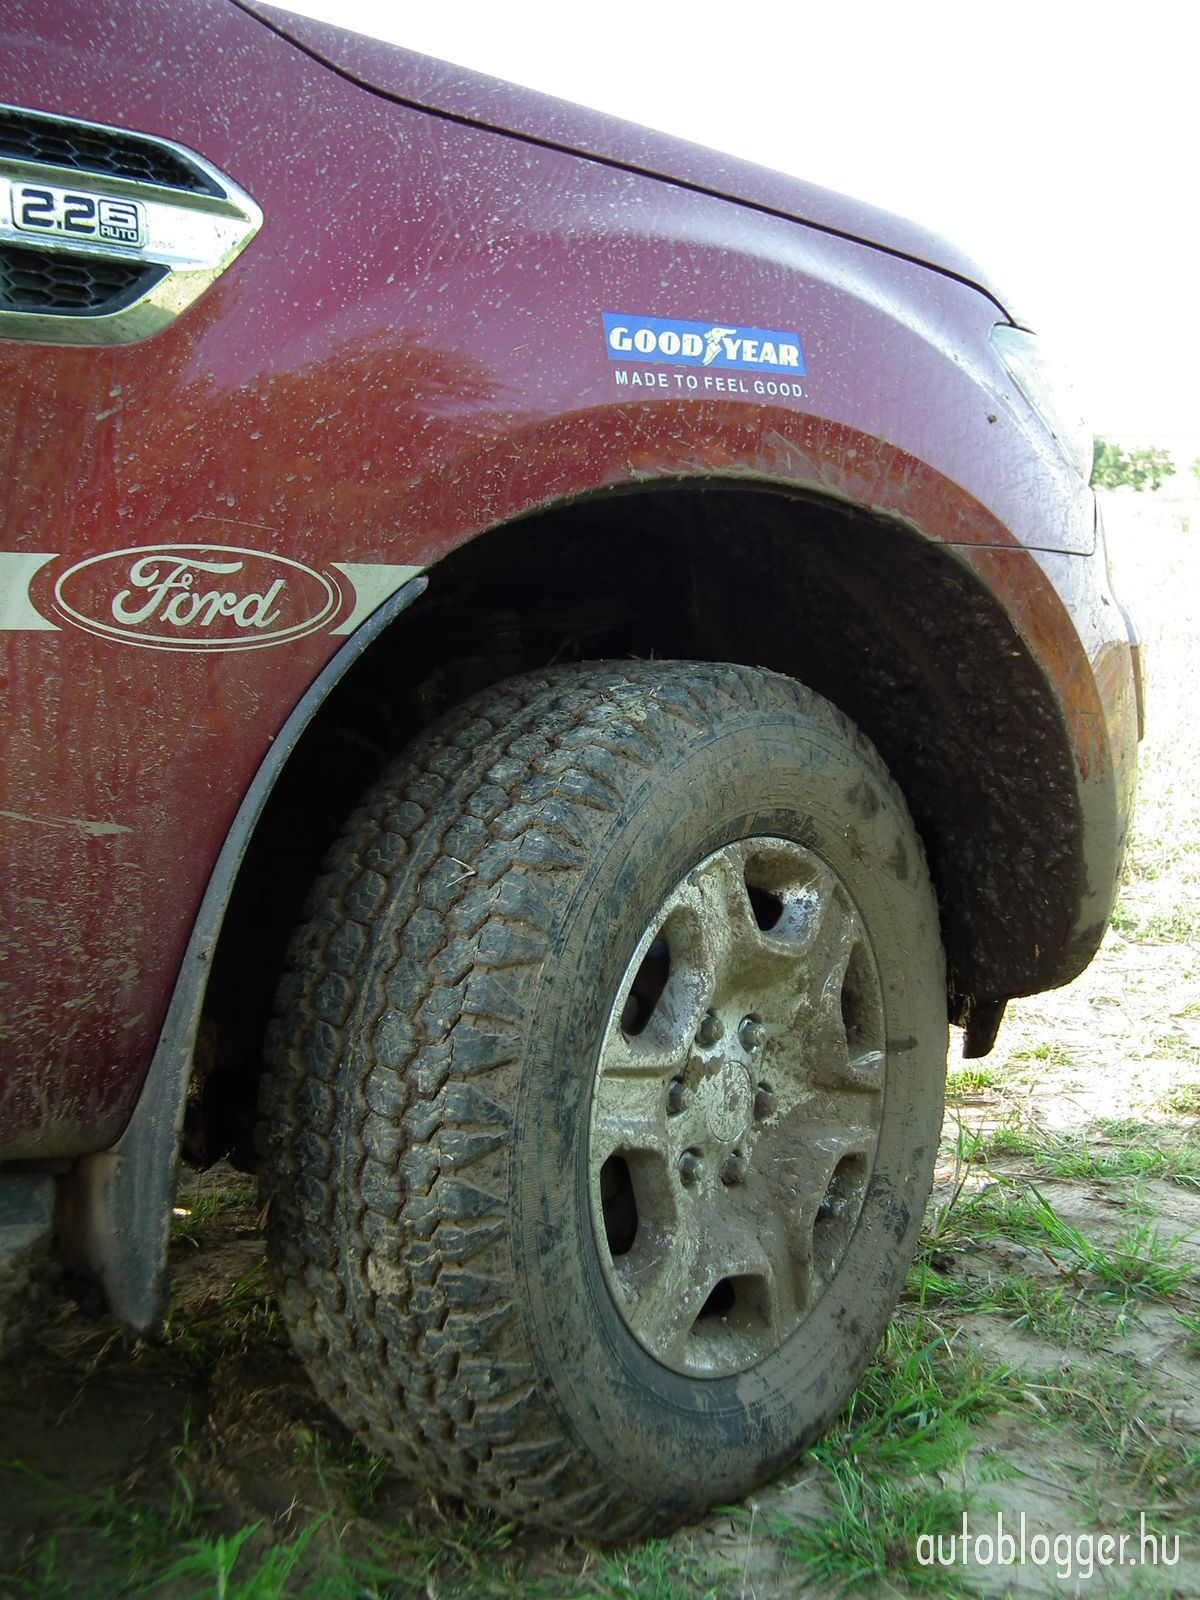 Ford_Ranger_teszt_autoblogger.hu_004554656